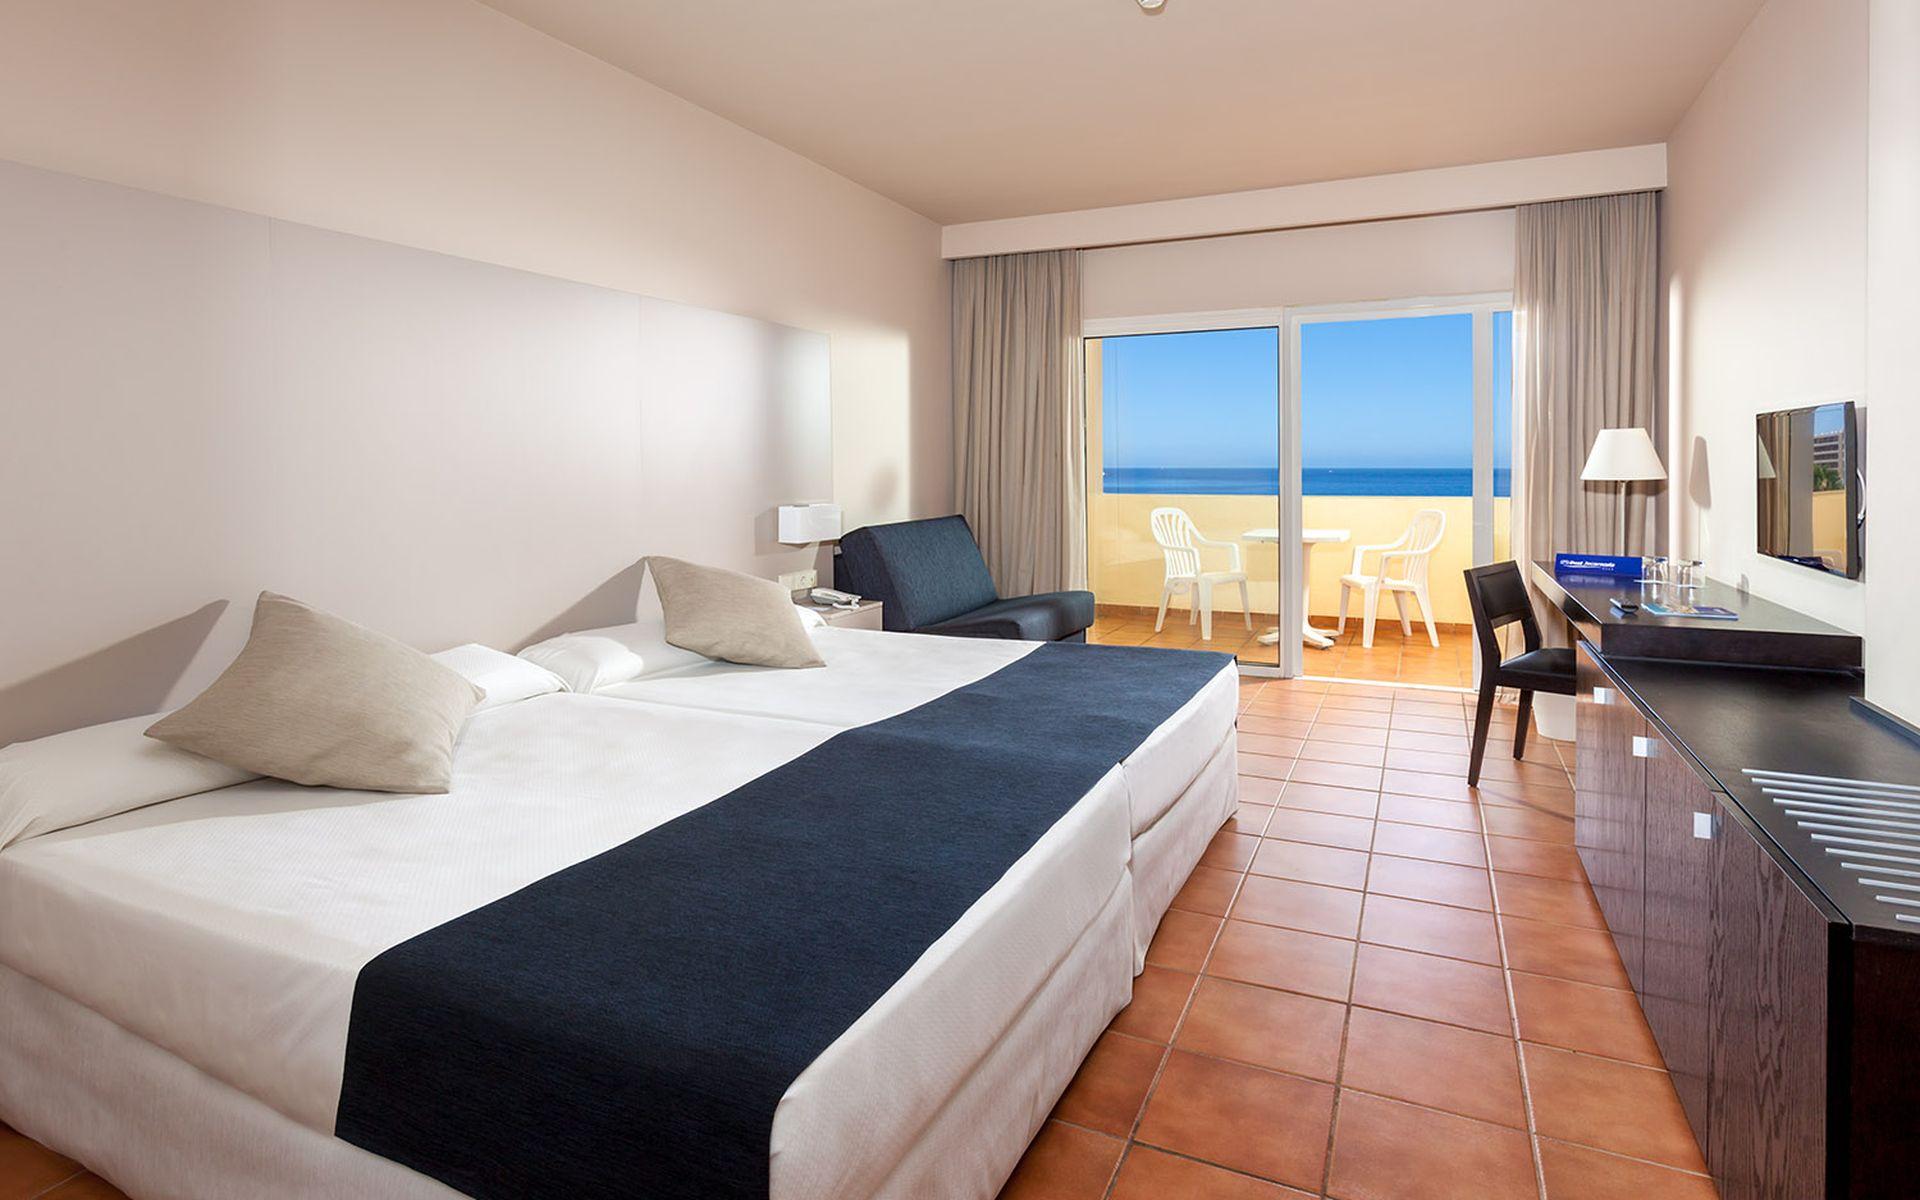 Hotel jacaranda en costa adeje tenerife desde 40 for Habitacion familiar tenerife